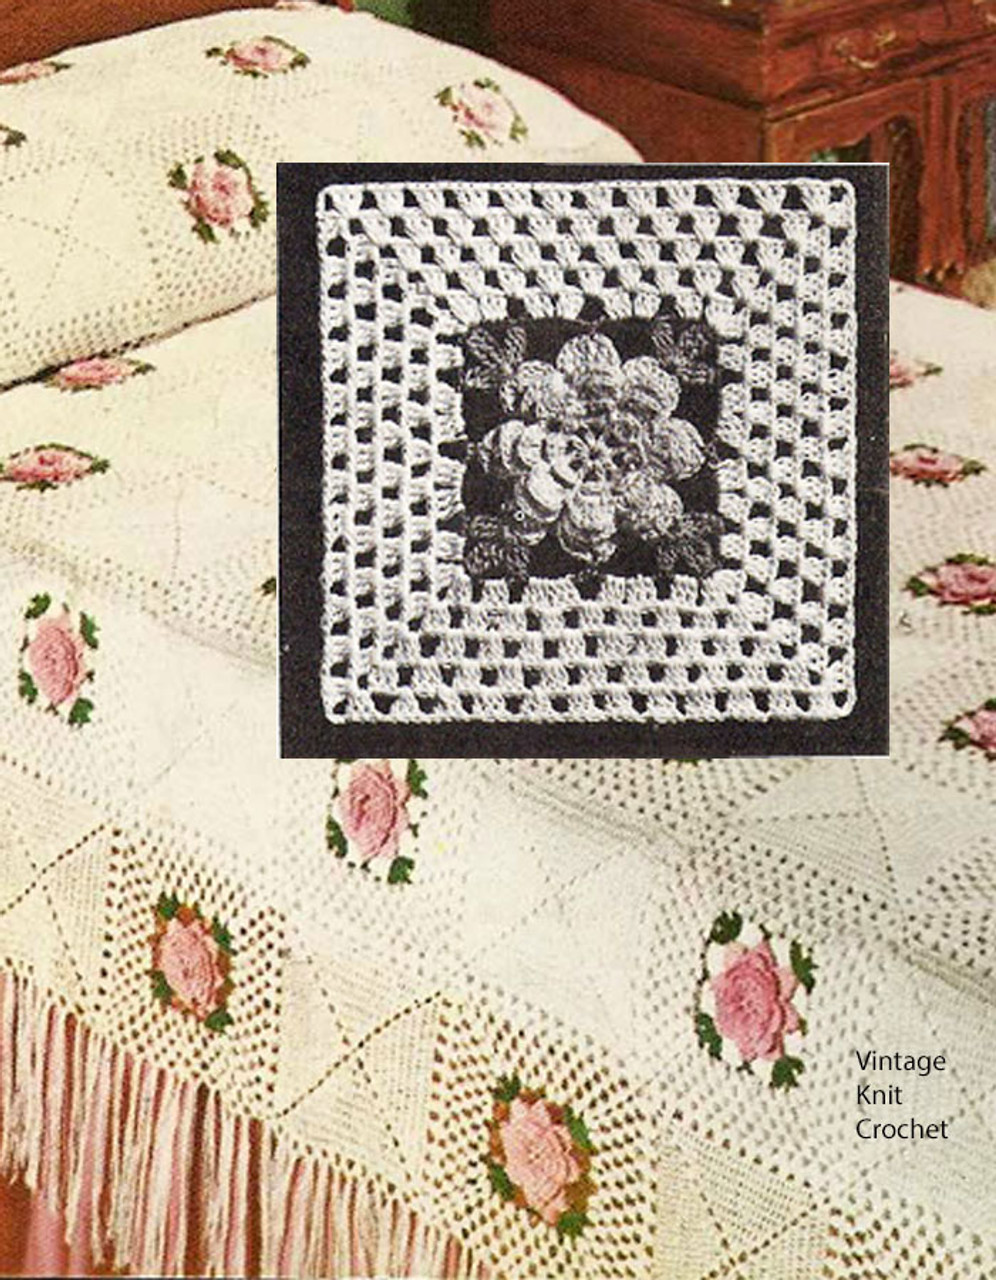 Crochet Rose Bedspread Pattern, Square Blocks